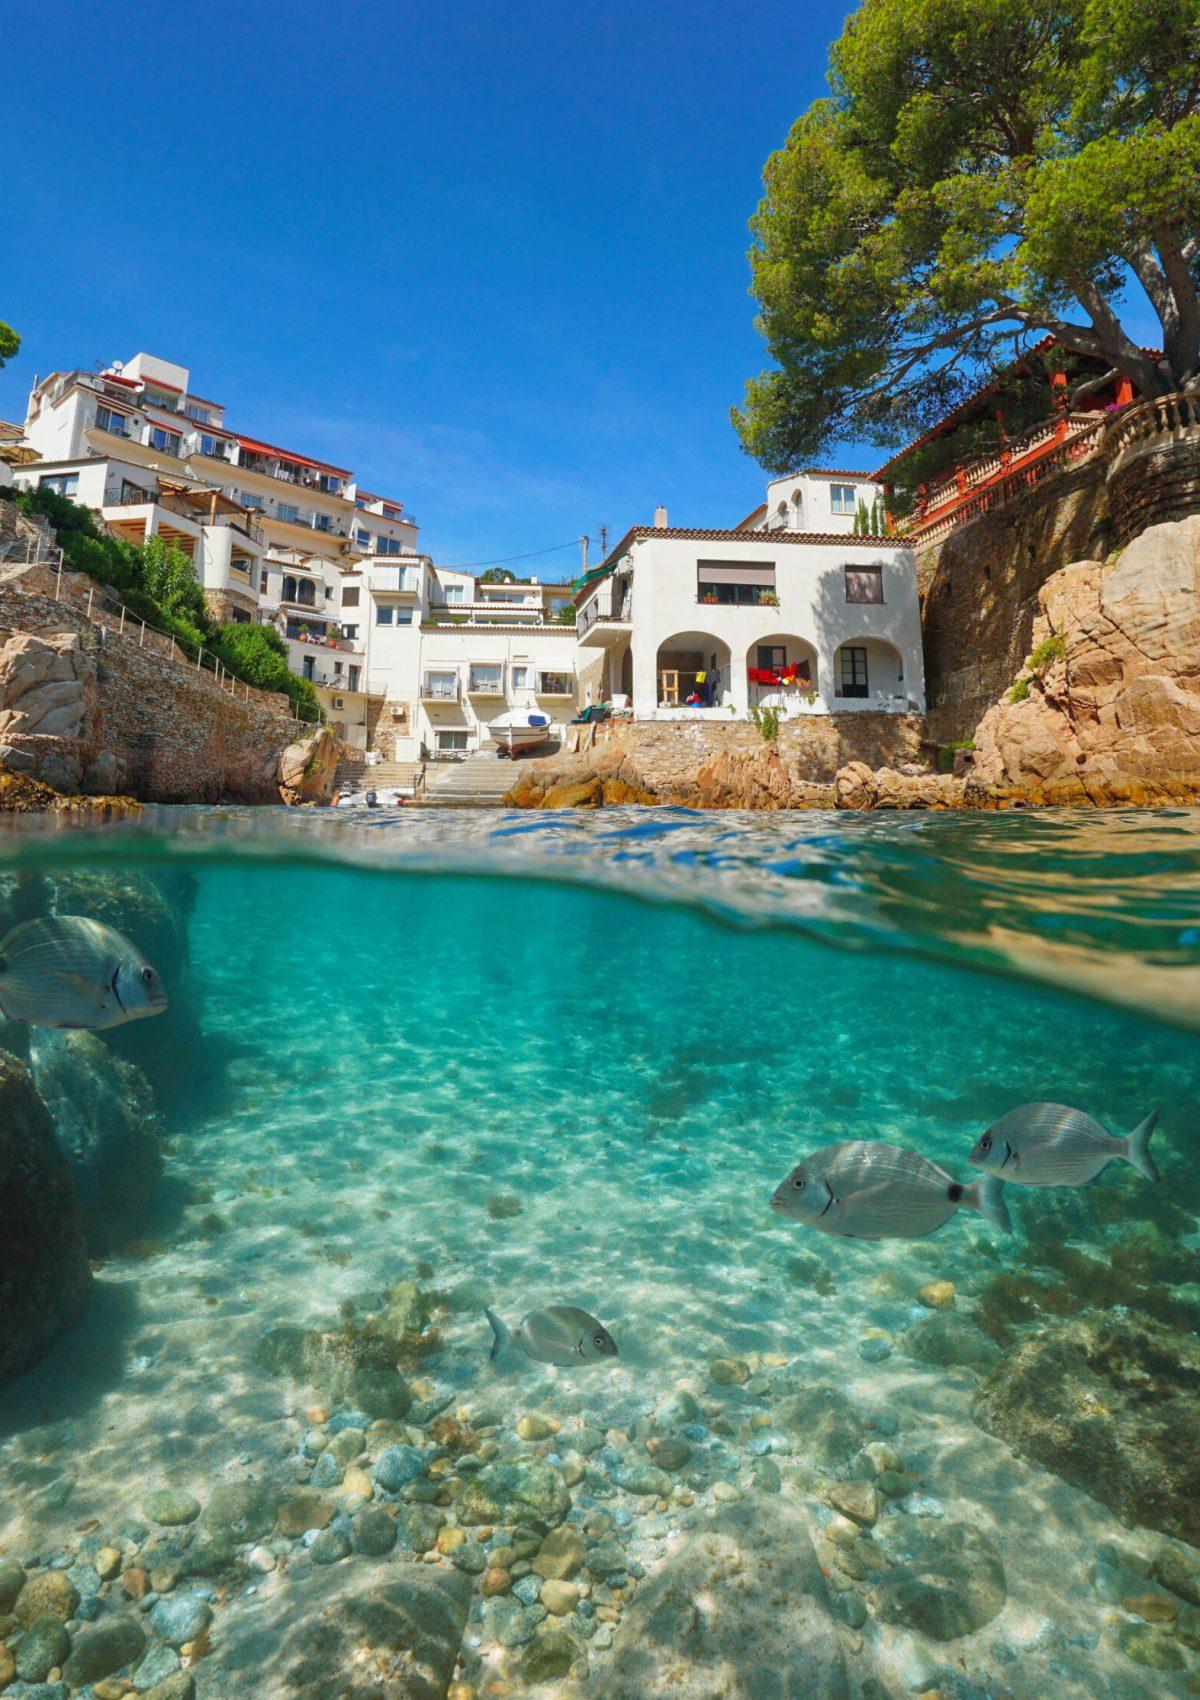 Spain Costa Brava typical village on the Mediterranean coast and fish underwater, Fornells de Mar, split view half above and below sea surface, Begur, Catalonia